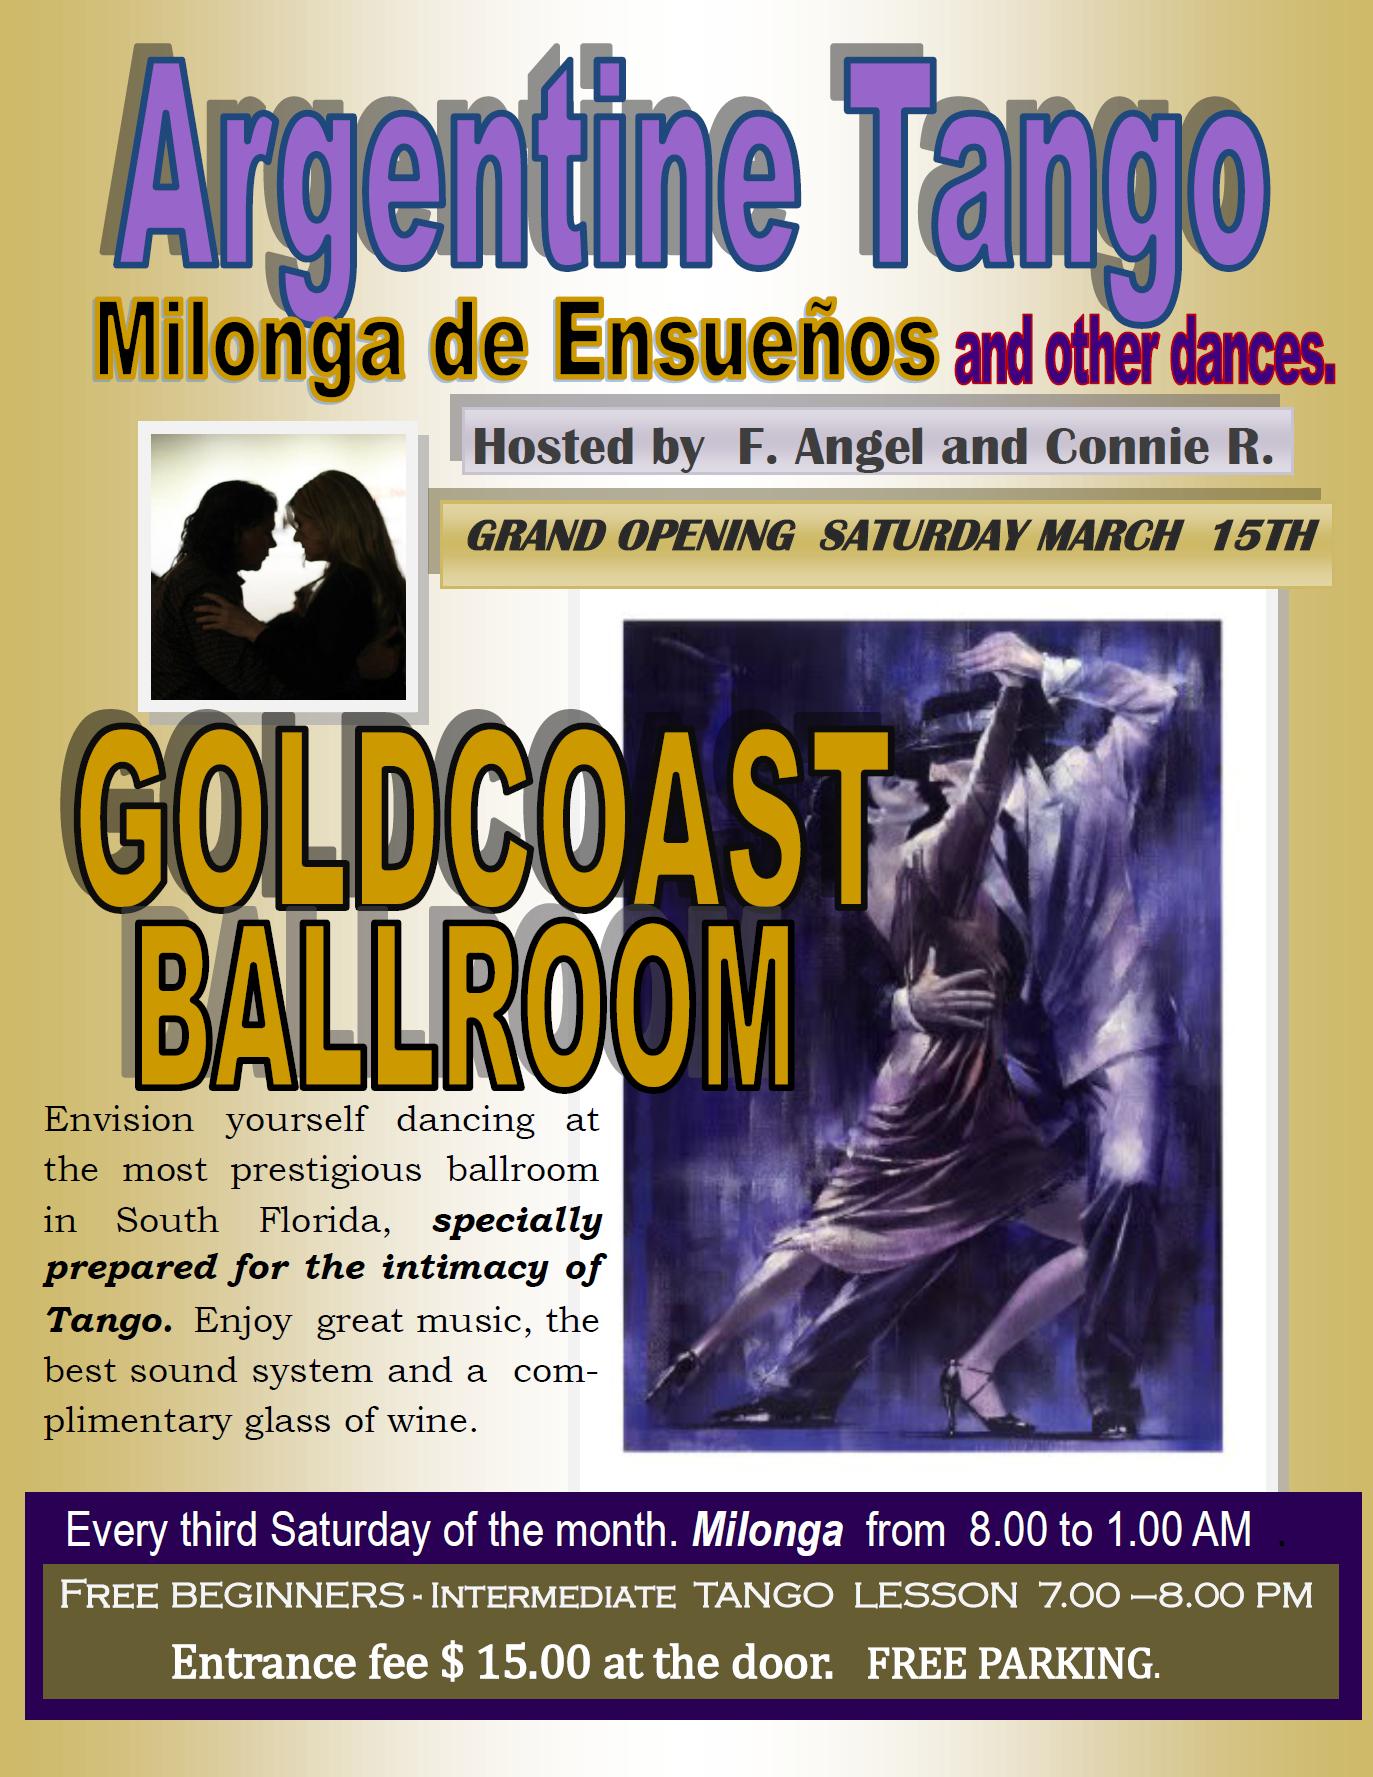 Milonga de Ensueños - March 15, 2014 - 8:00 PM - 1:00 AM